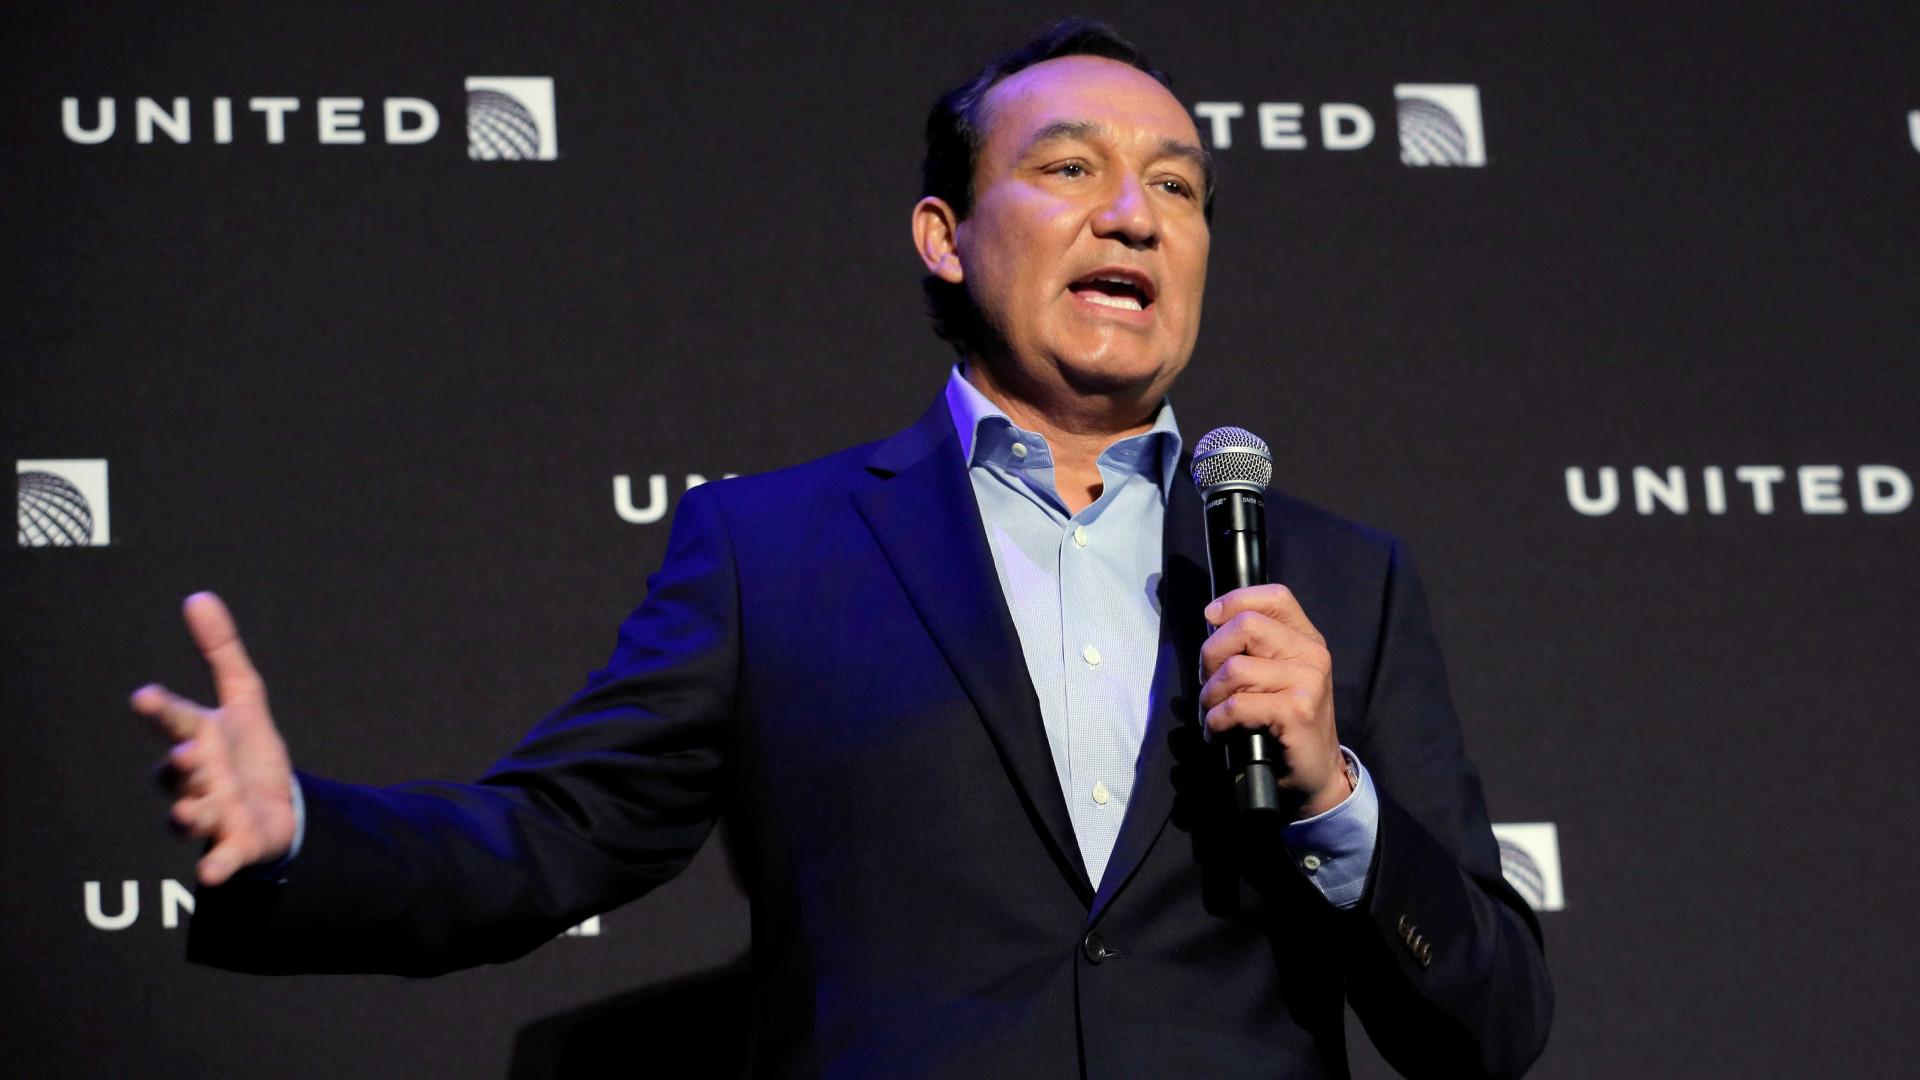 Diretor da United Airlines visita China para reduzir tensões